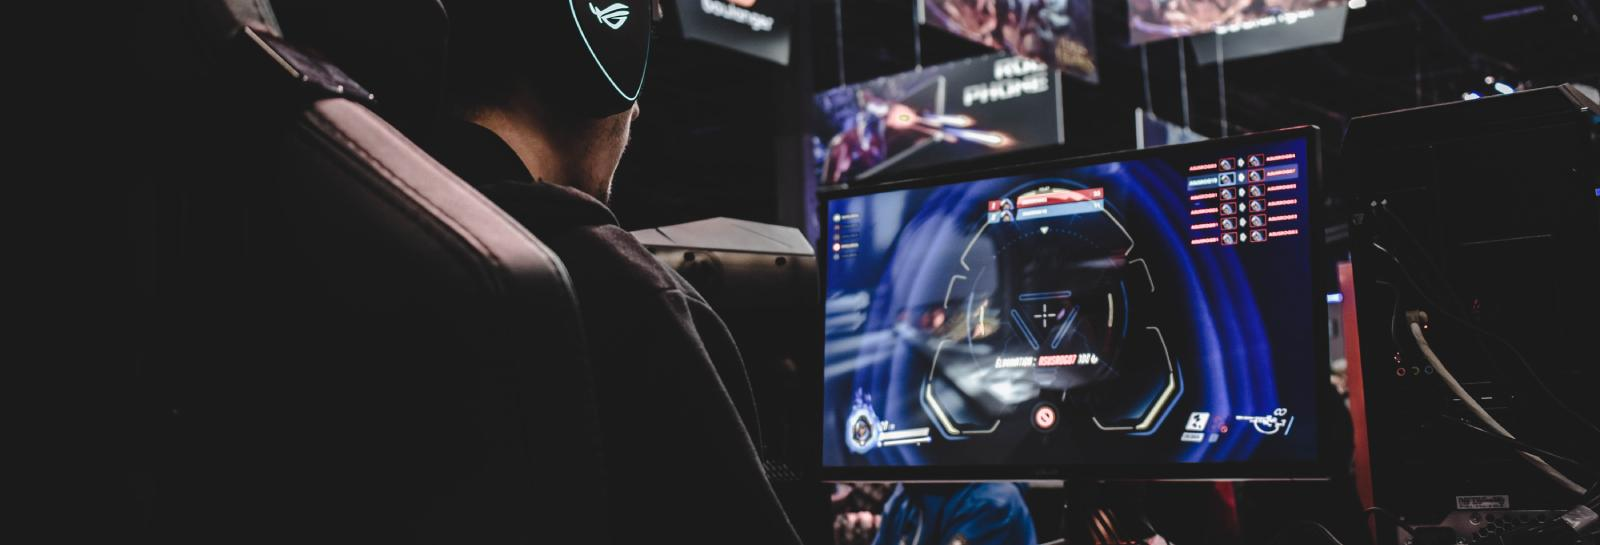 gamer-protocol-gaming-tournament